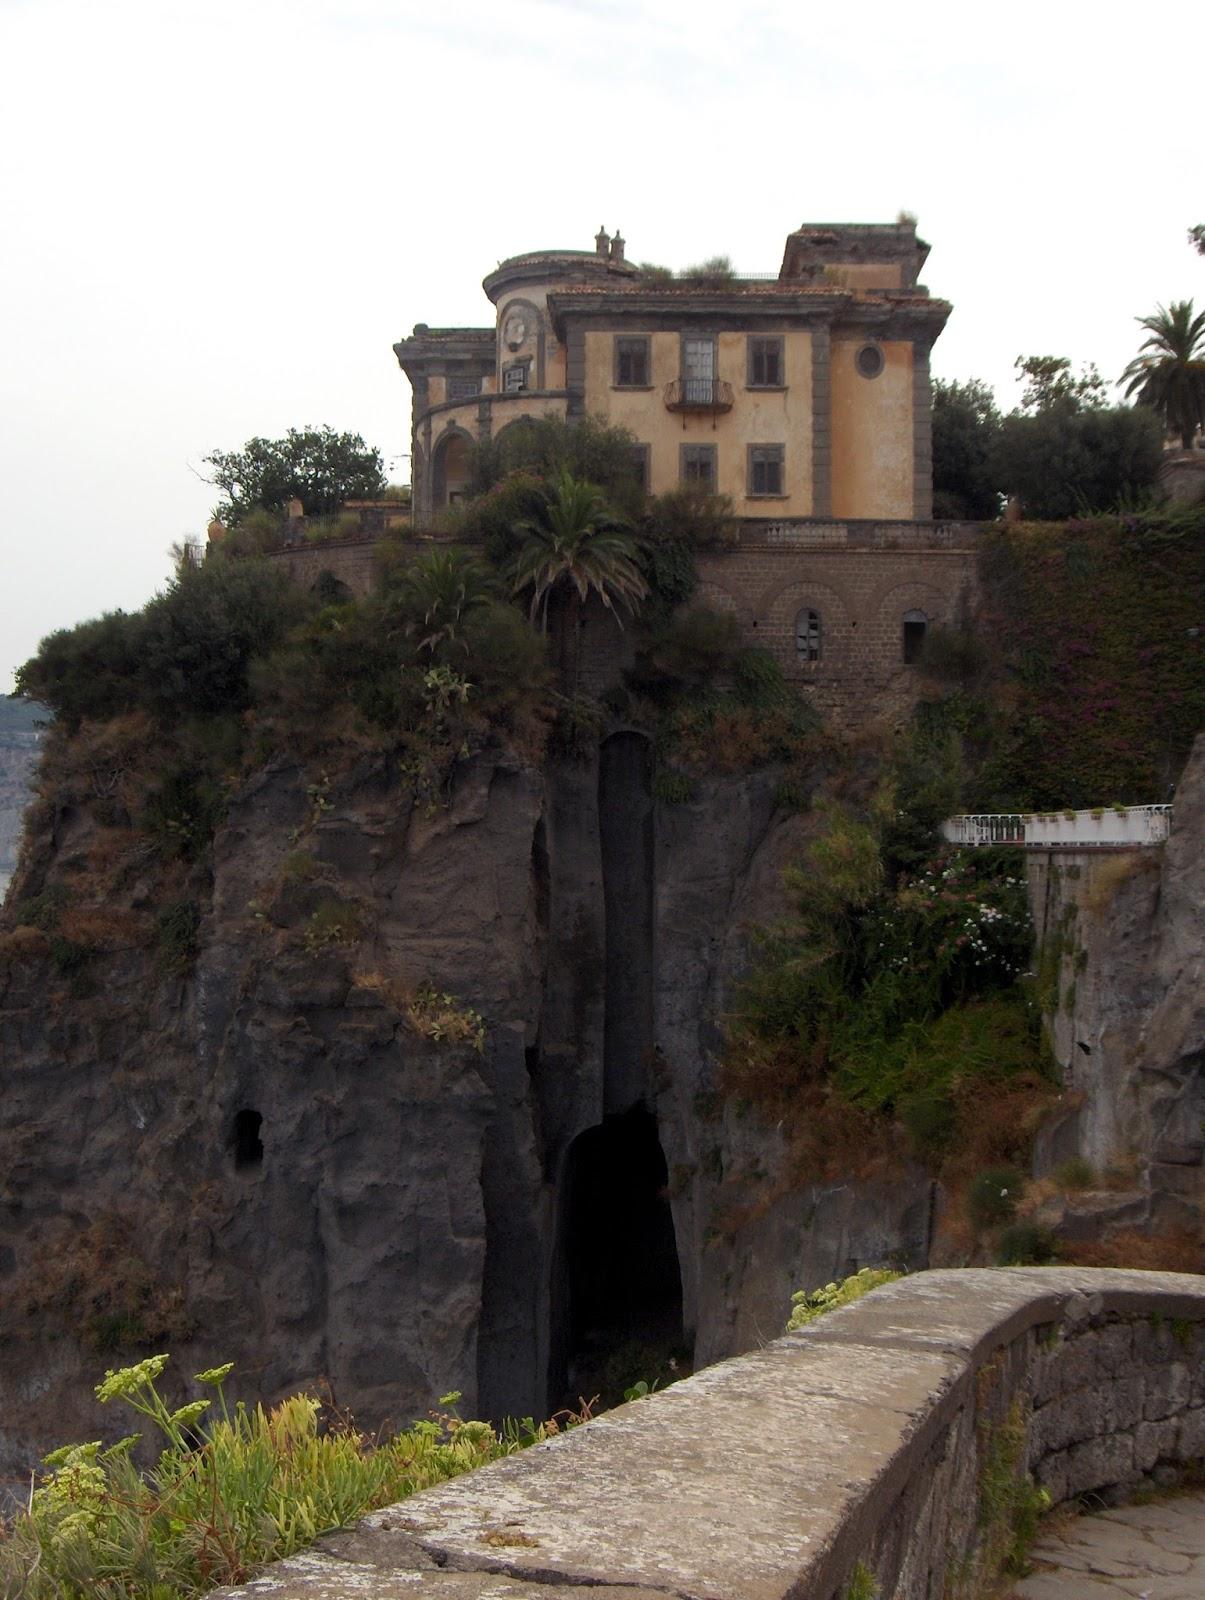 Capri, italy, caprese, getting to capri from Sorrento, from Naples, travel, sea stacks, view,